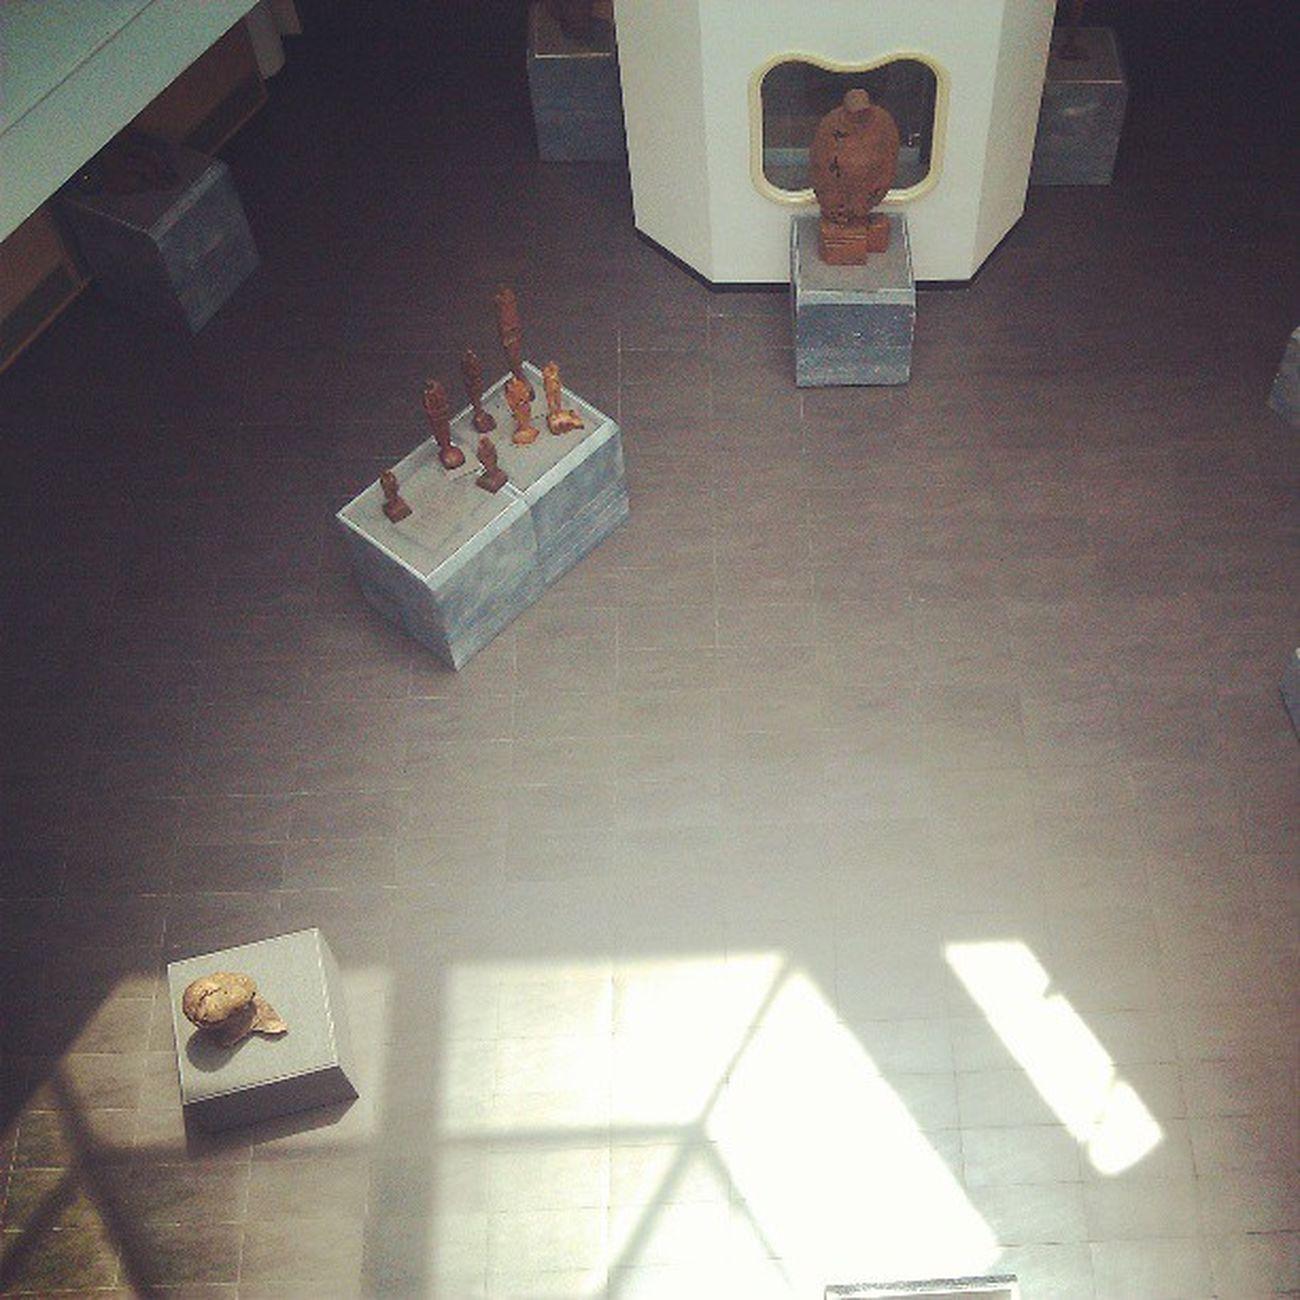 校外教學 三義木雕博物館 建築 設計 結構 美學 清水混凝土 愉悅 開心 學習 Offcampusteaching Wood carving Cultural Park Architecture architecturaldesign design Happy Structure Learning Landscapearchitecture Landscape Aesthetics Pleasure Fairfacedconcrete